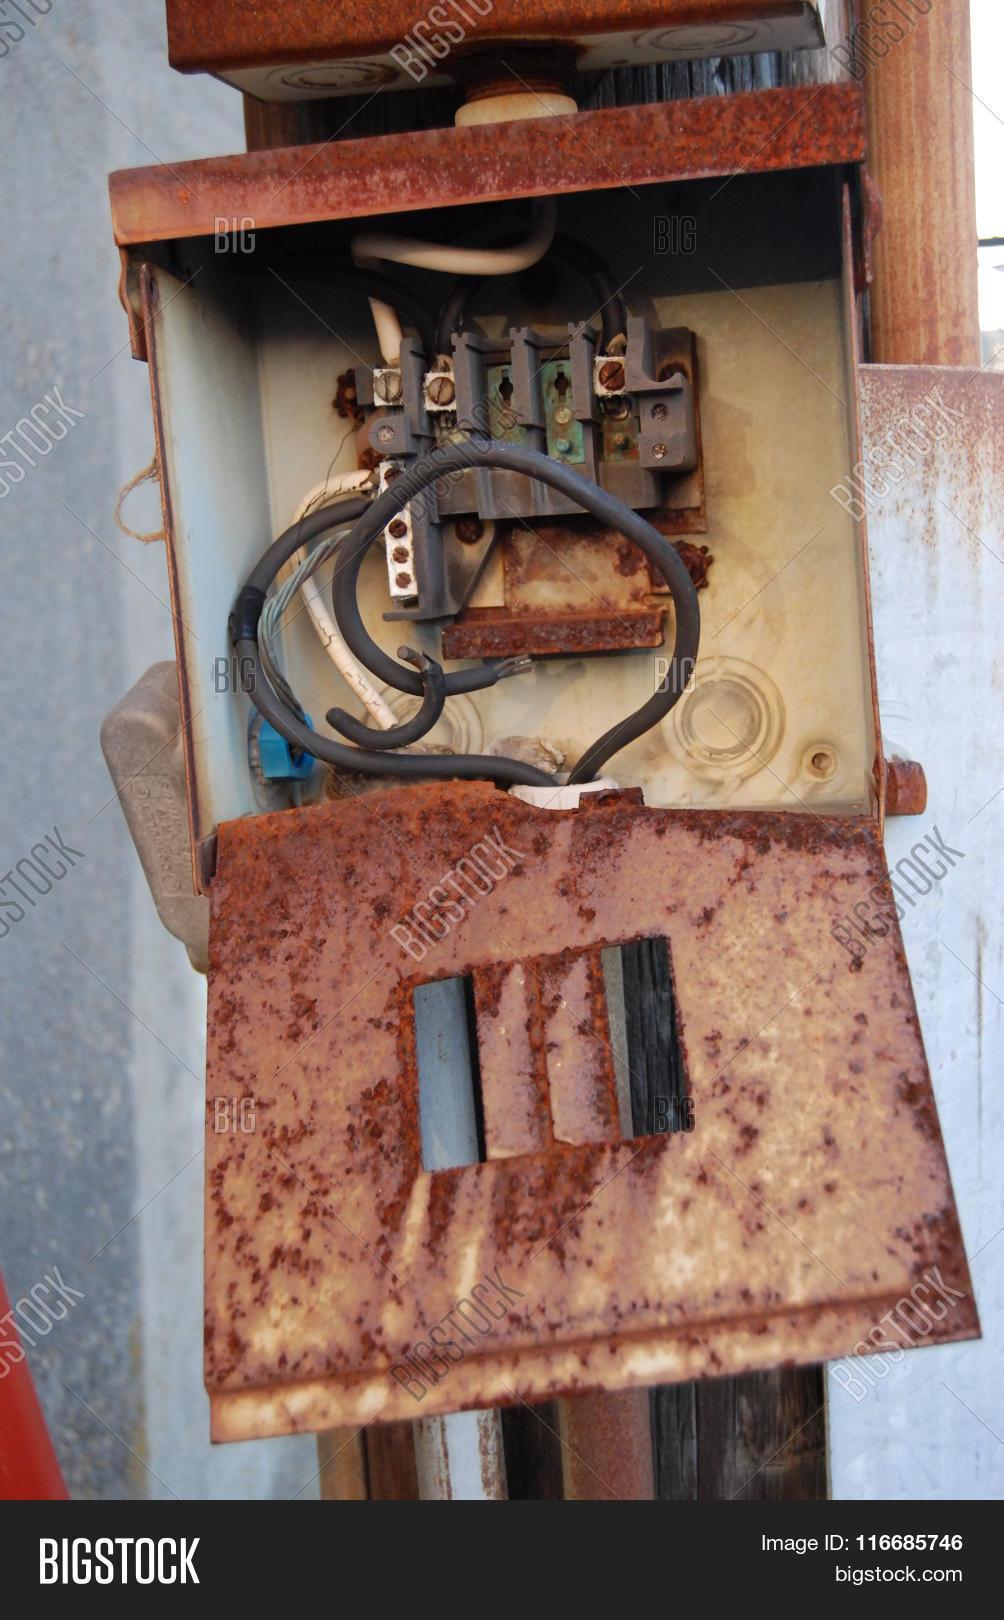 Broken Fuse Box Simple Wiring Diagram Painless Image Photo Free Trial Bigstock Blown Glass